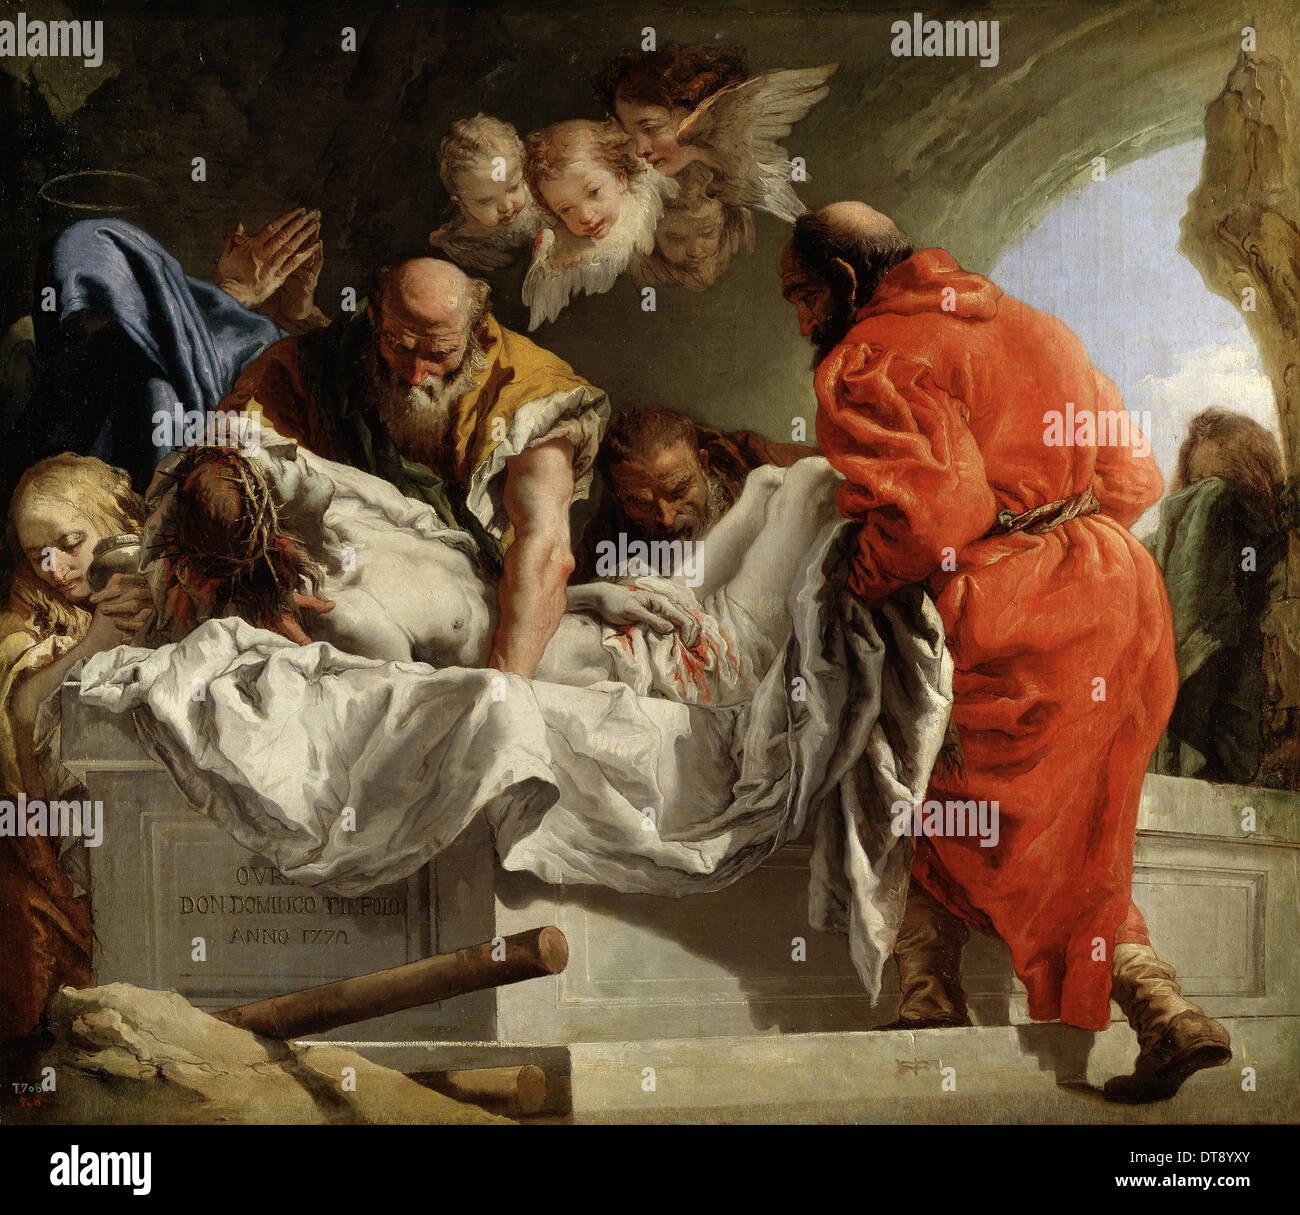 the entombment of christ 1772 artist tiepolo giandomenico